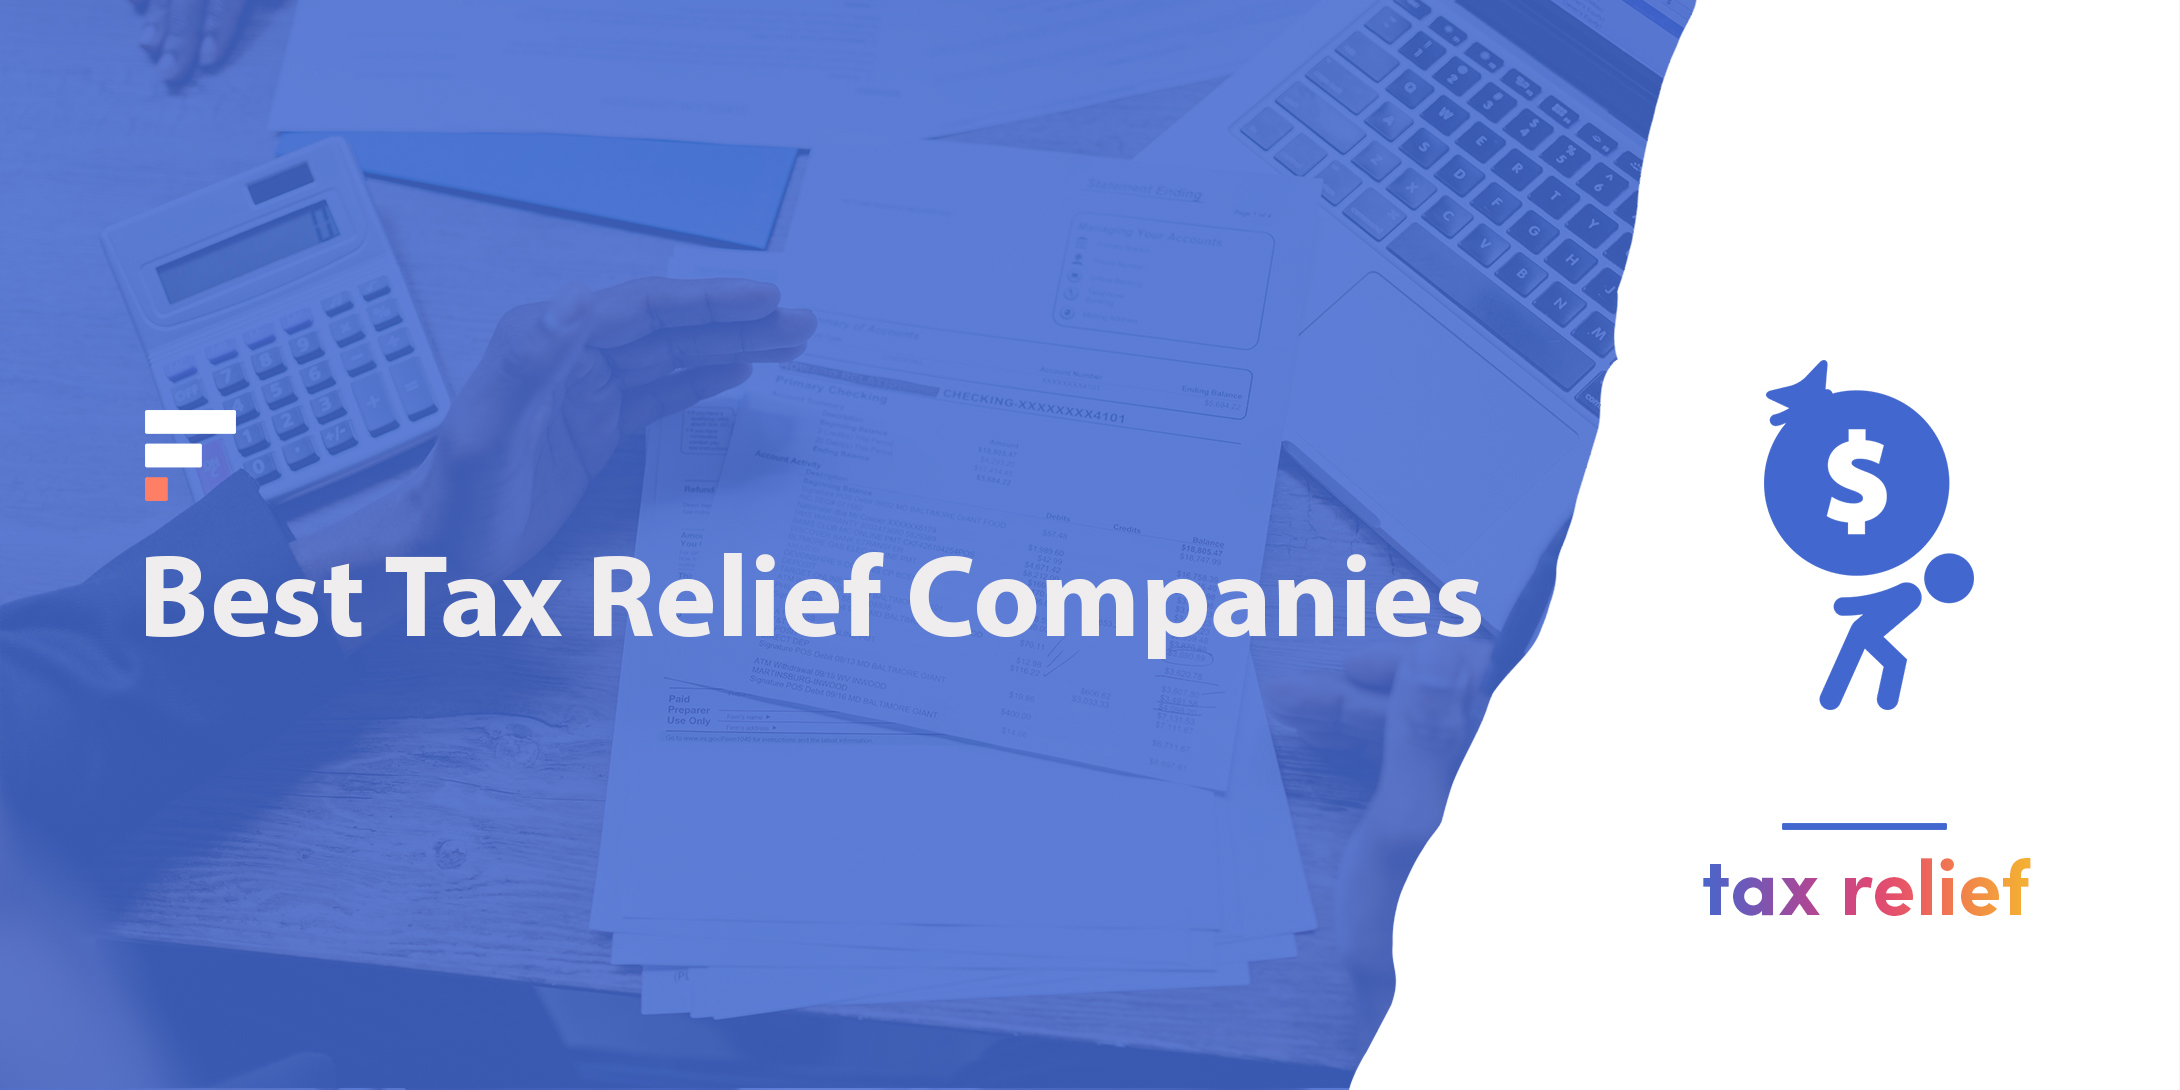 Best tax relief companies